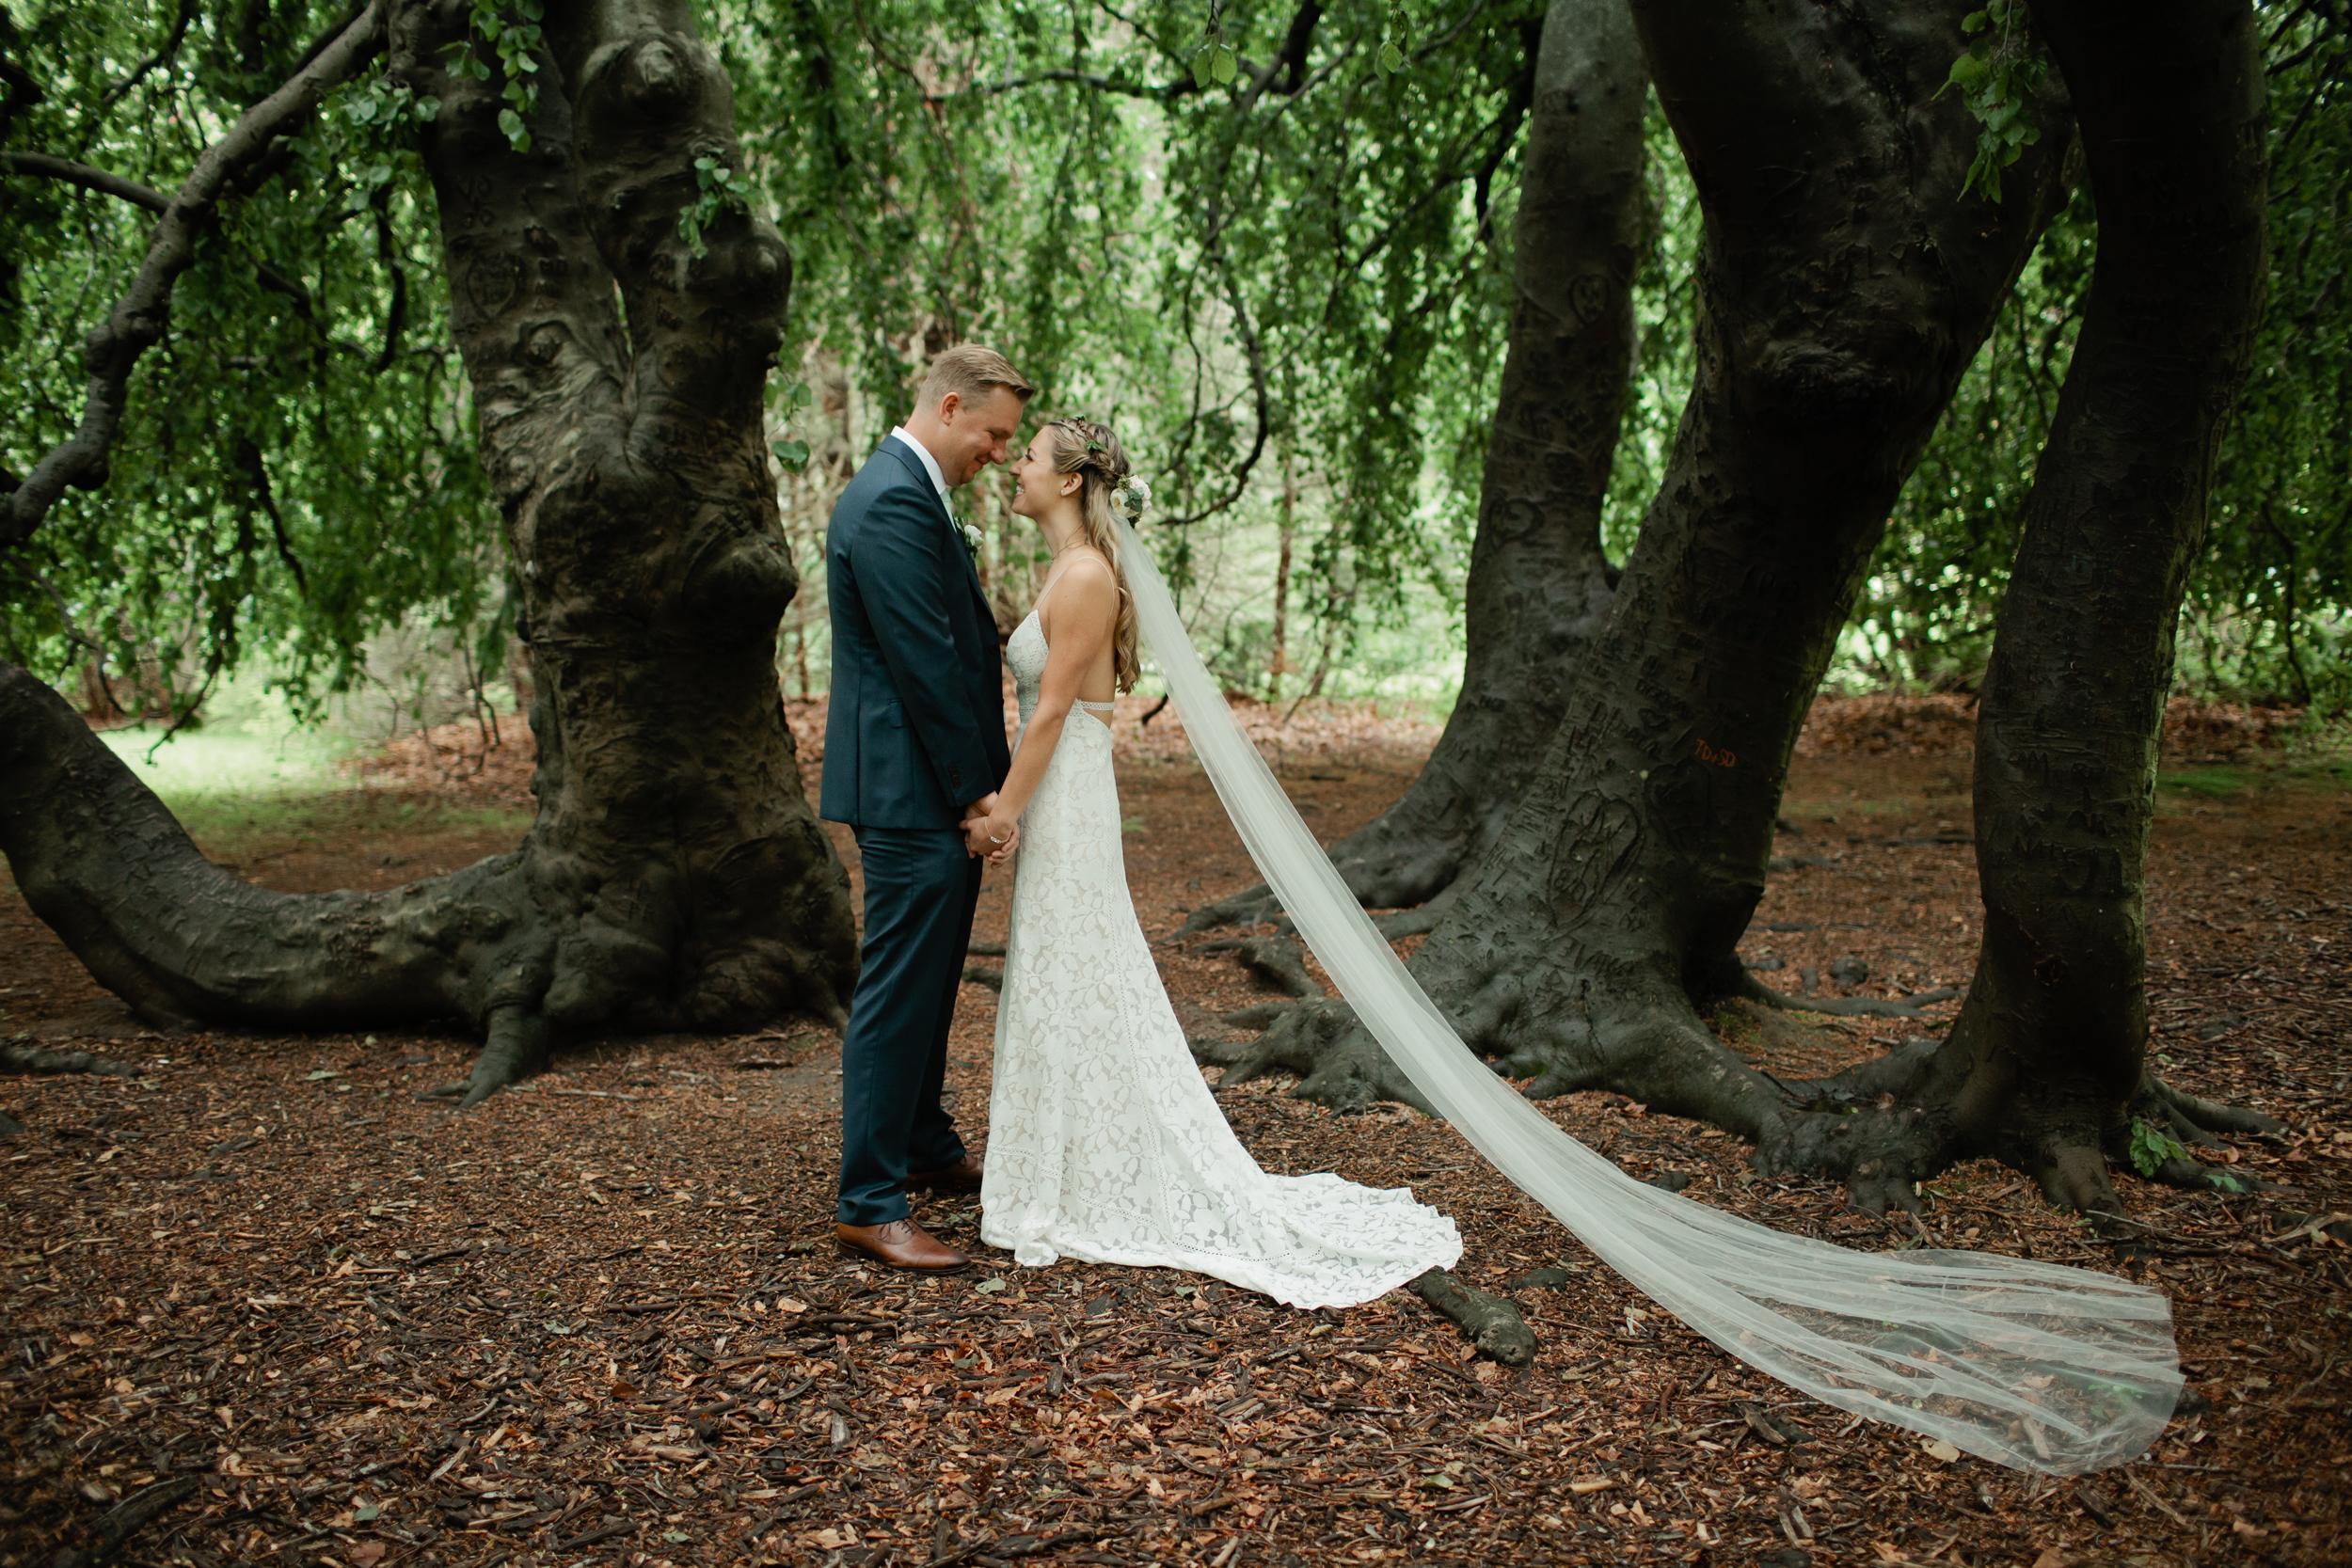 Best-Maine-Wedding-Photographer-76.jpg